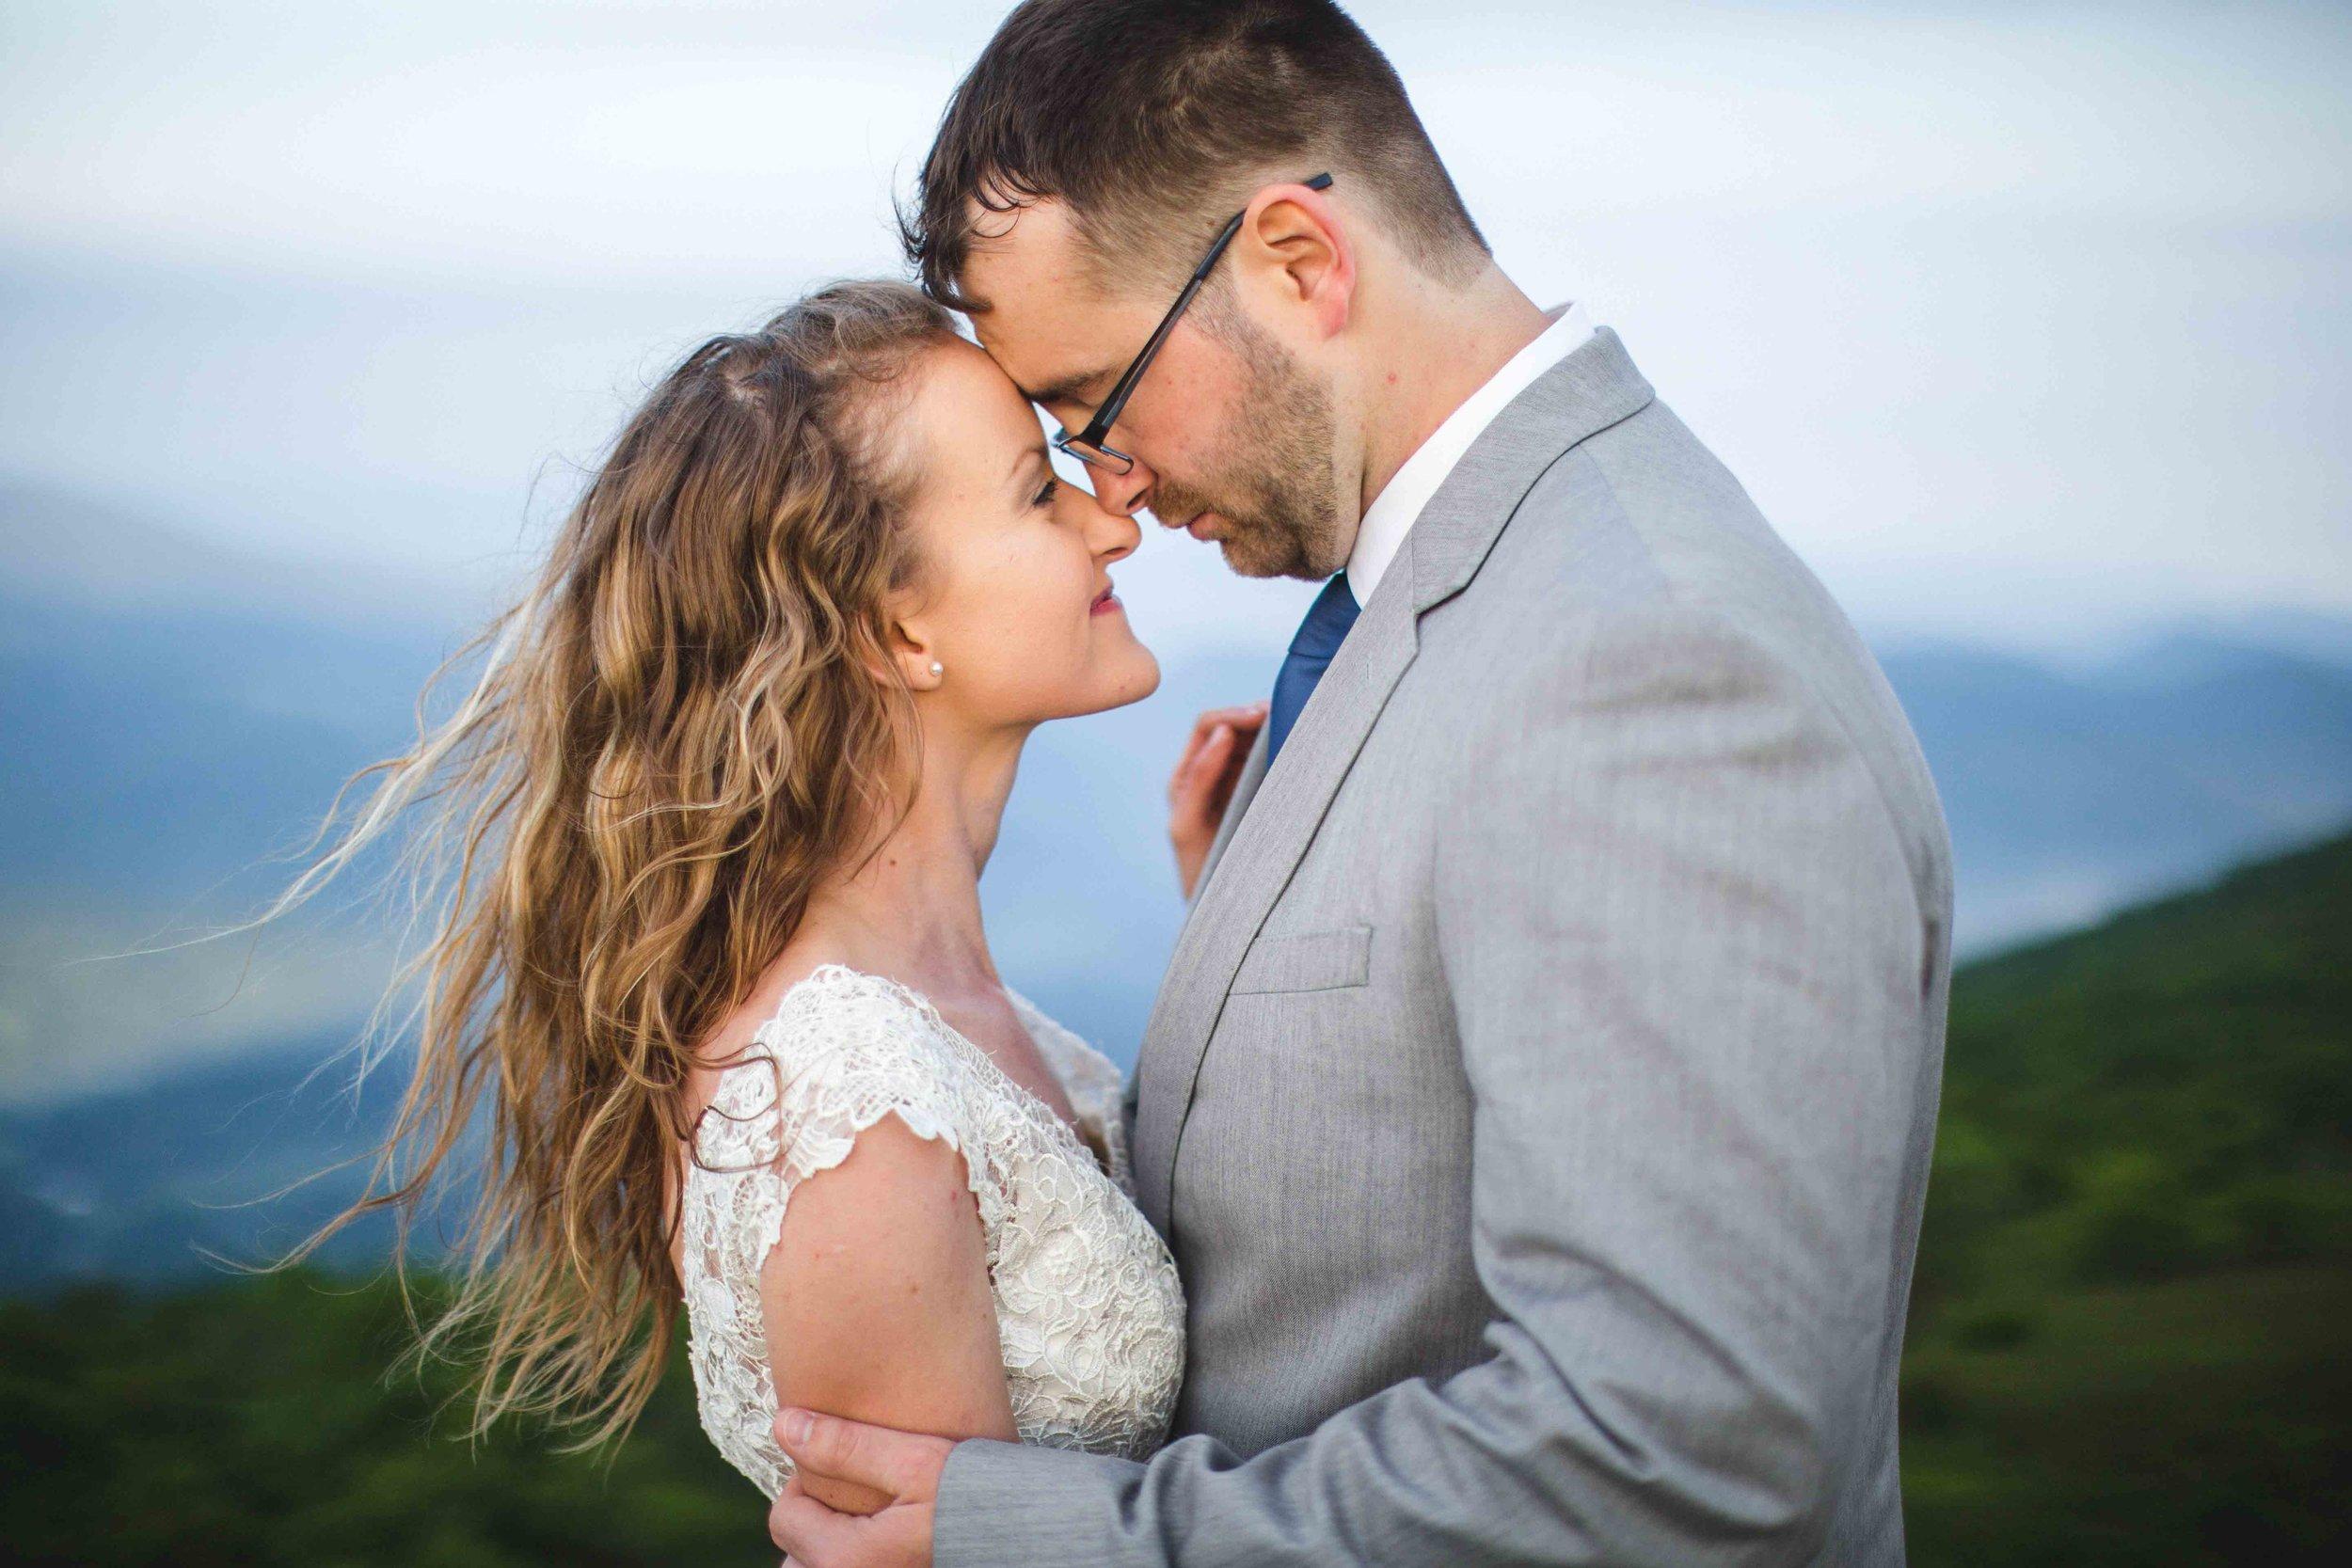 north-carolina-elopement-photographer-76.jpg